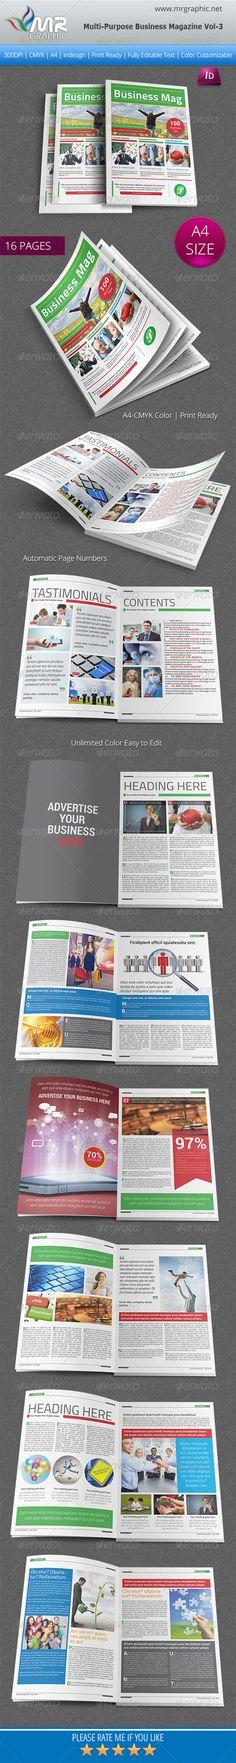 Multipurpose #Business Magazine Vol 3 - #Magazines #Print #Templates Download here: https://graphicriver.net/item/multipurpose-business-magazine-vol-3/6307362?ref=alena994